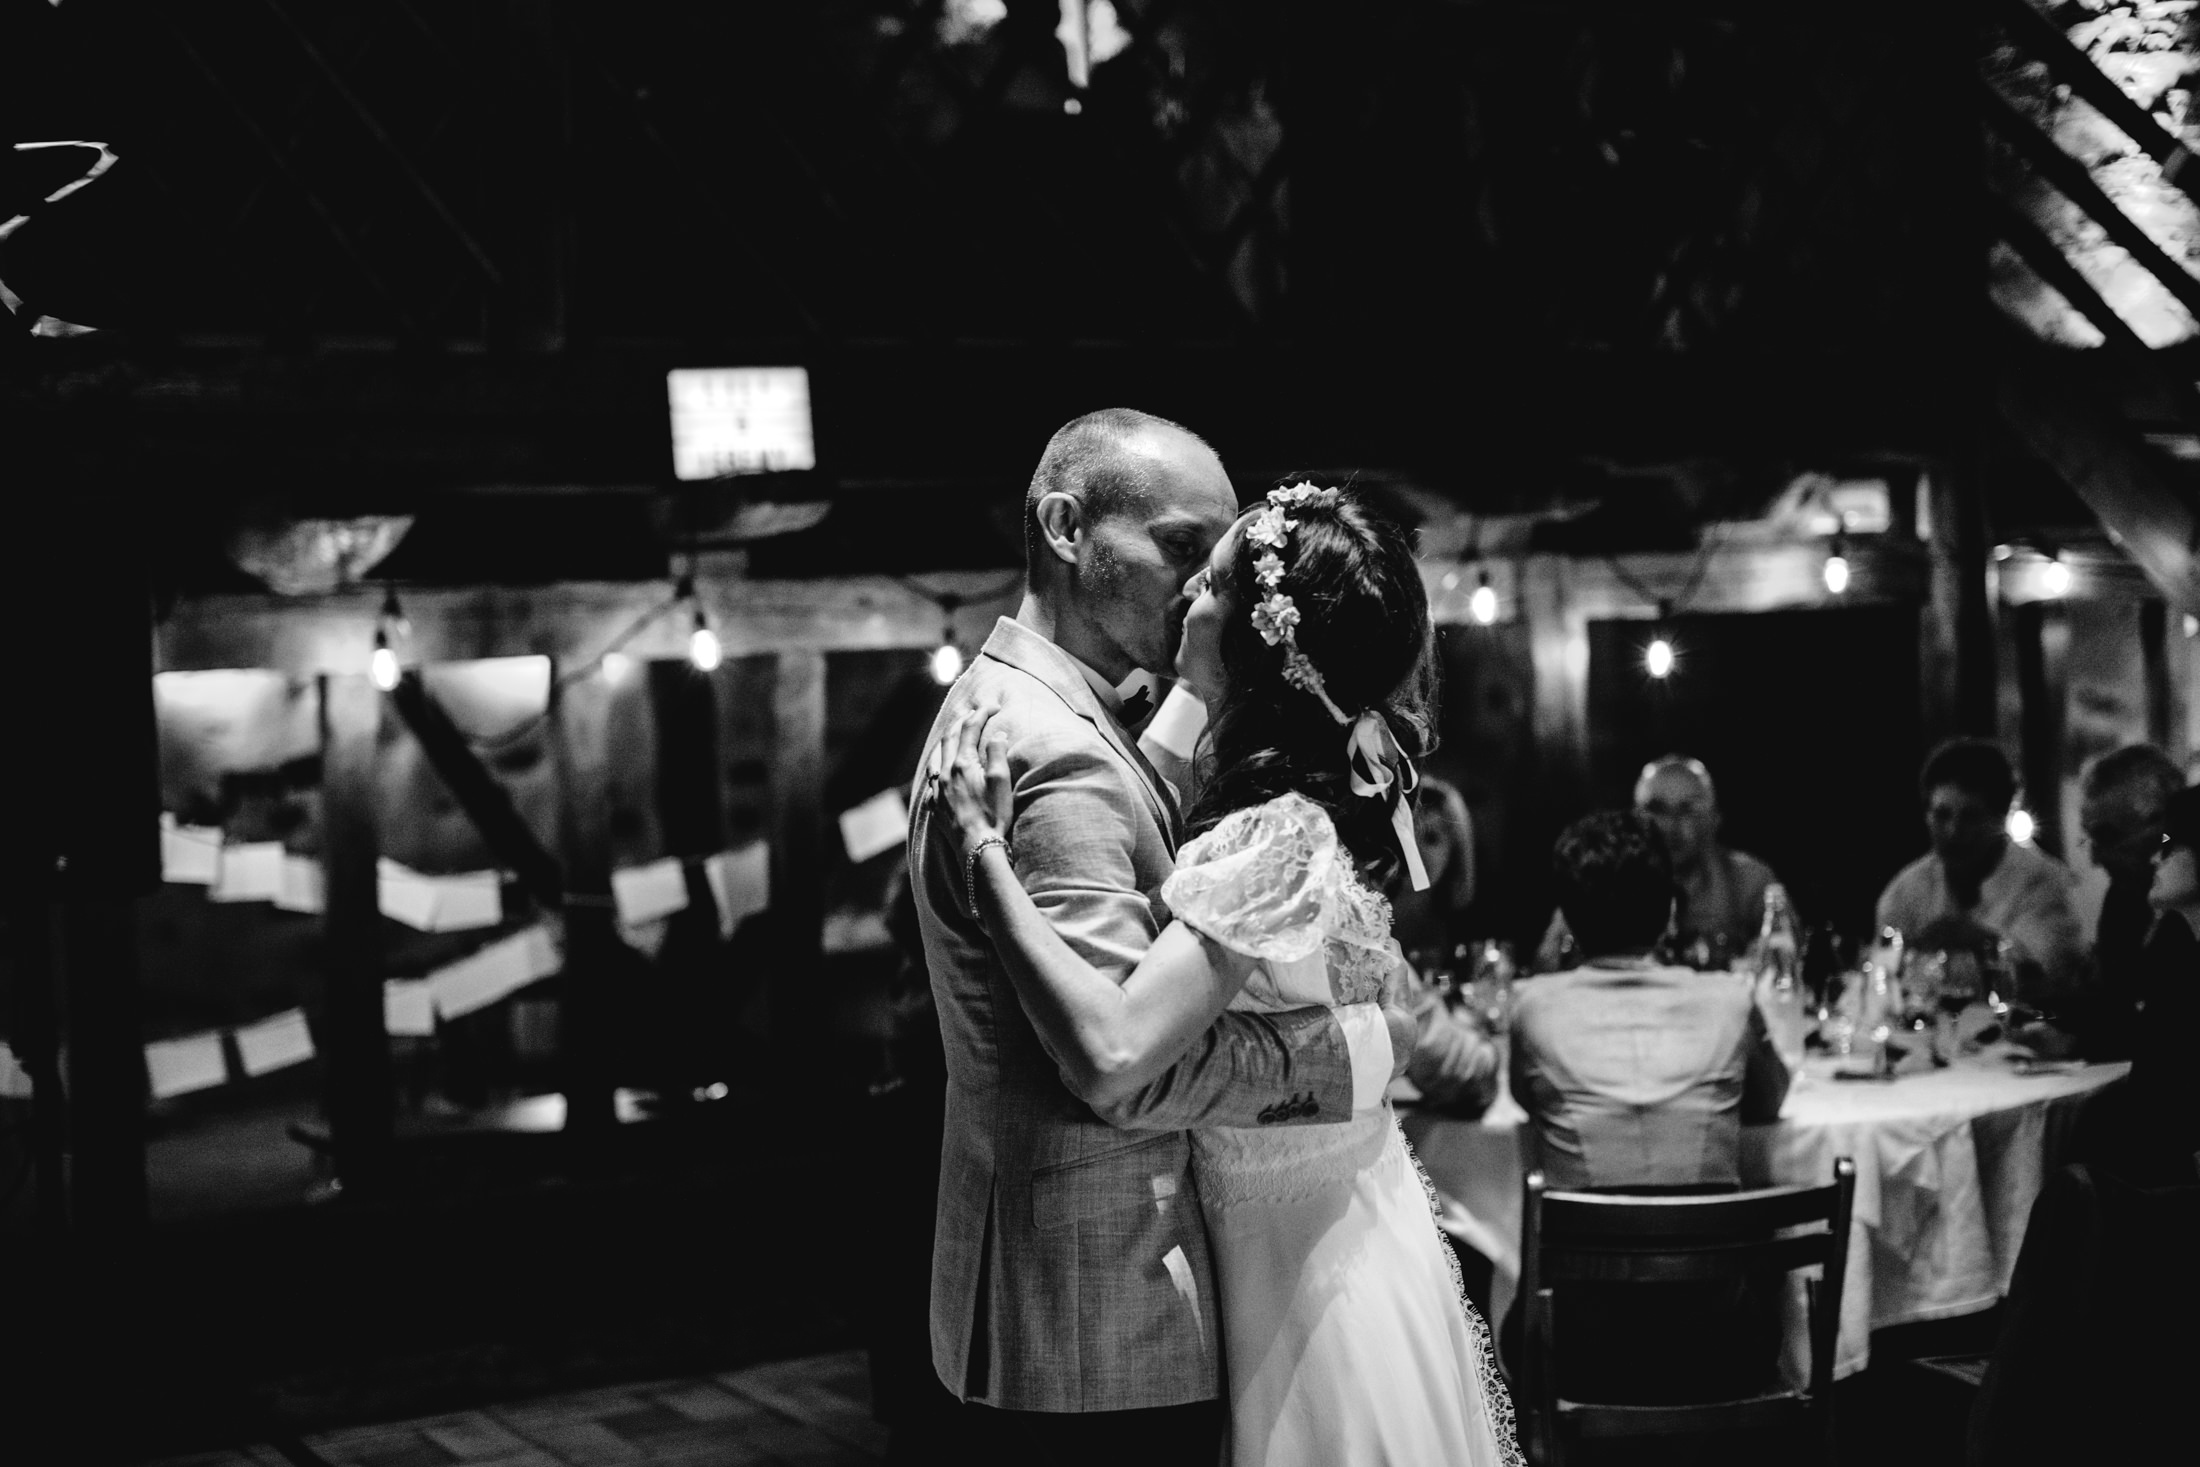 Mariage auvergne photographe wedding_-110.jpg